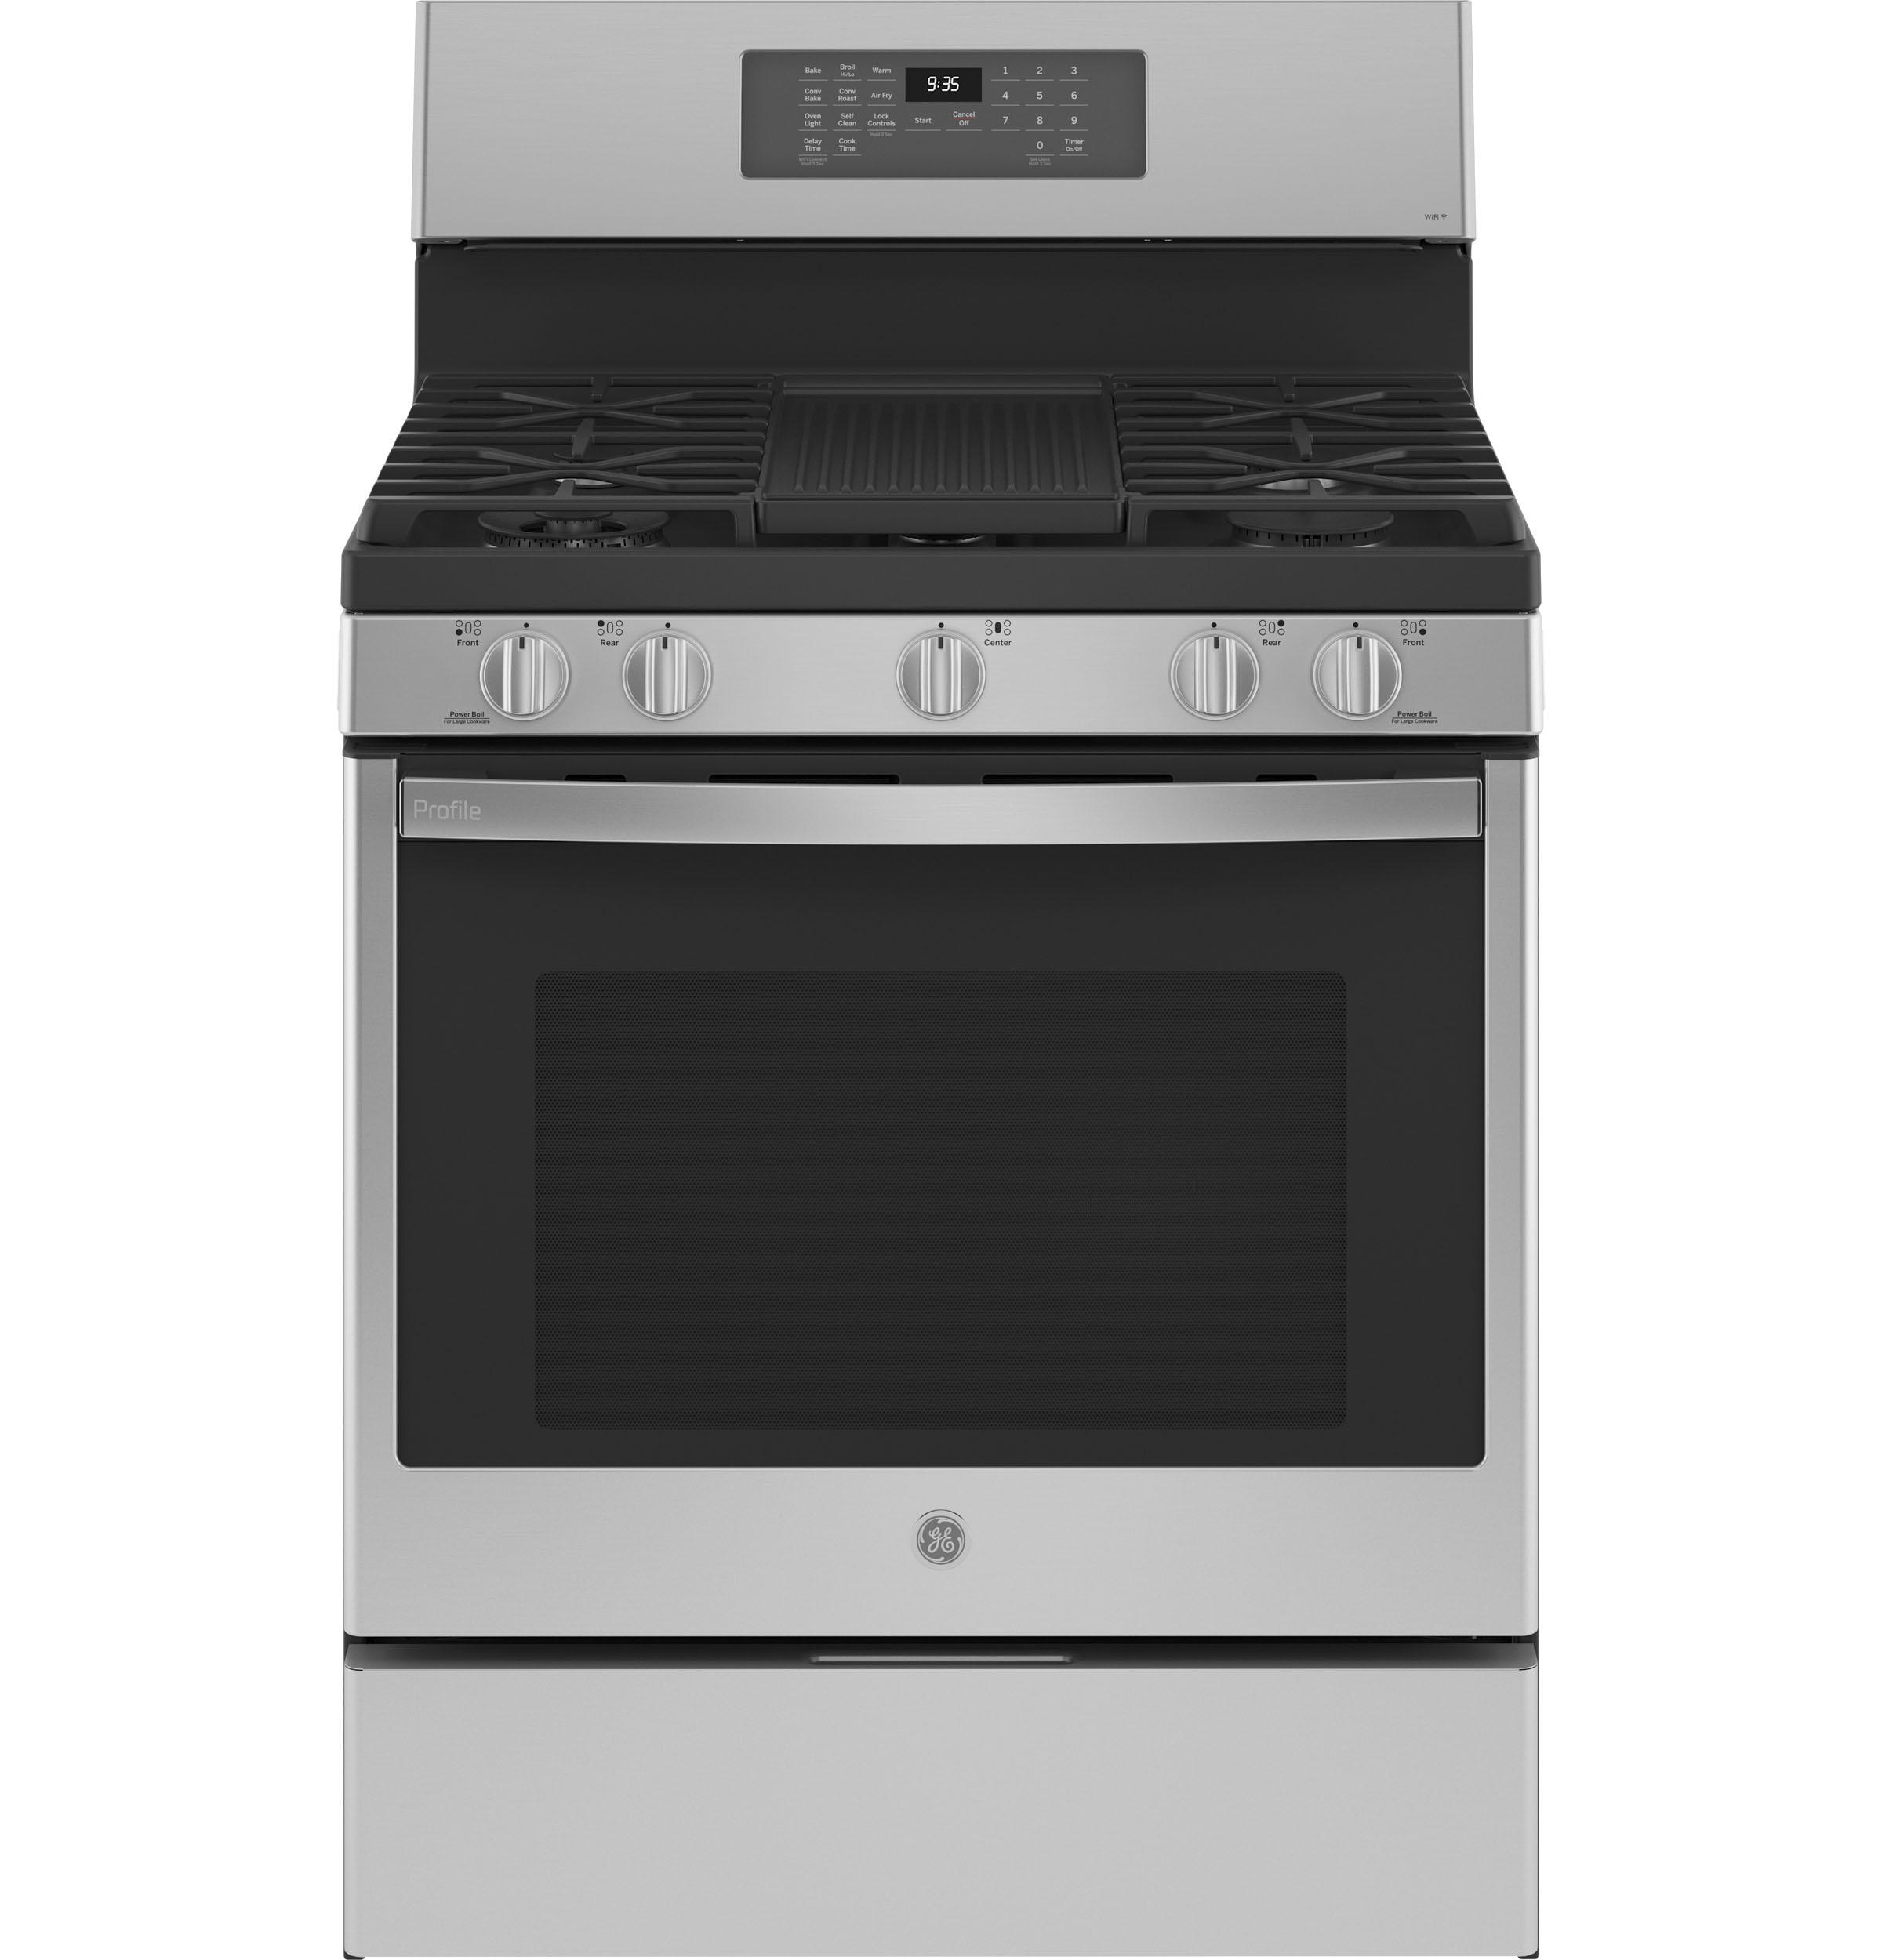 "GE Profile GE Profile™ 30"" Free-Standing Self Clean Dual-Fuel Fingerprint Resistant Range with Storage Drawer"